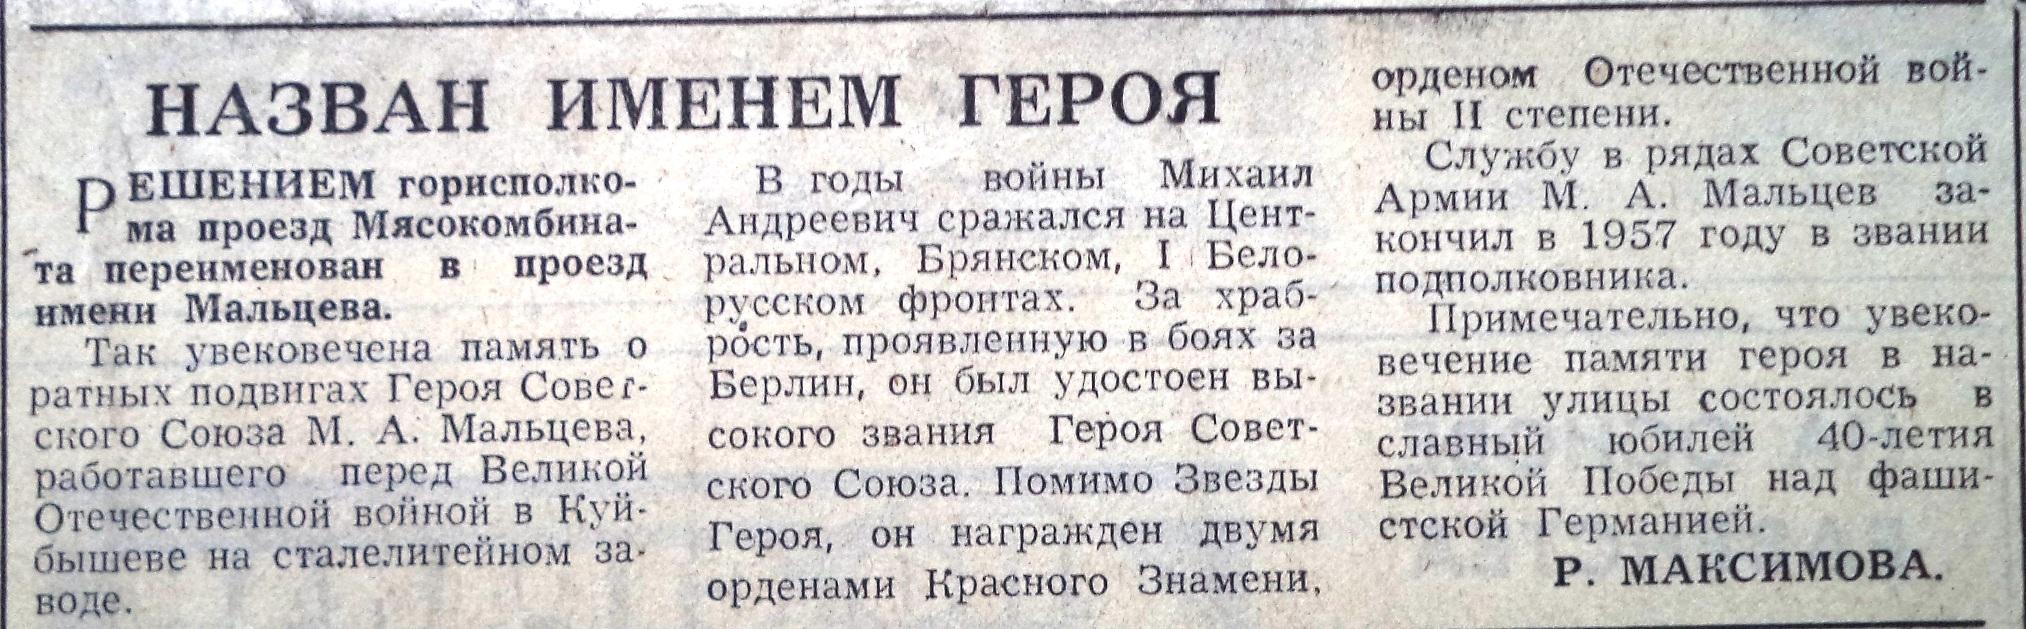 Мальцева-ФОТО-01-ВЗя-1985-08-27-переим. пр. Мясок. в пр. Мальцева